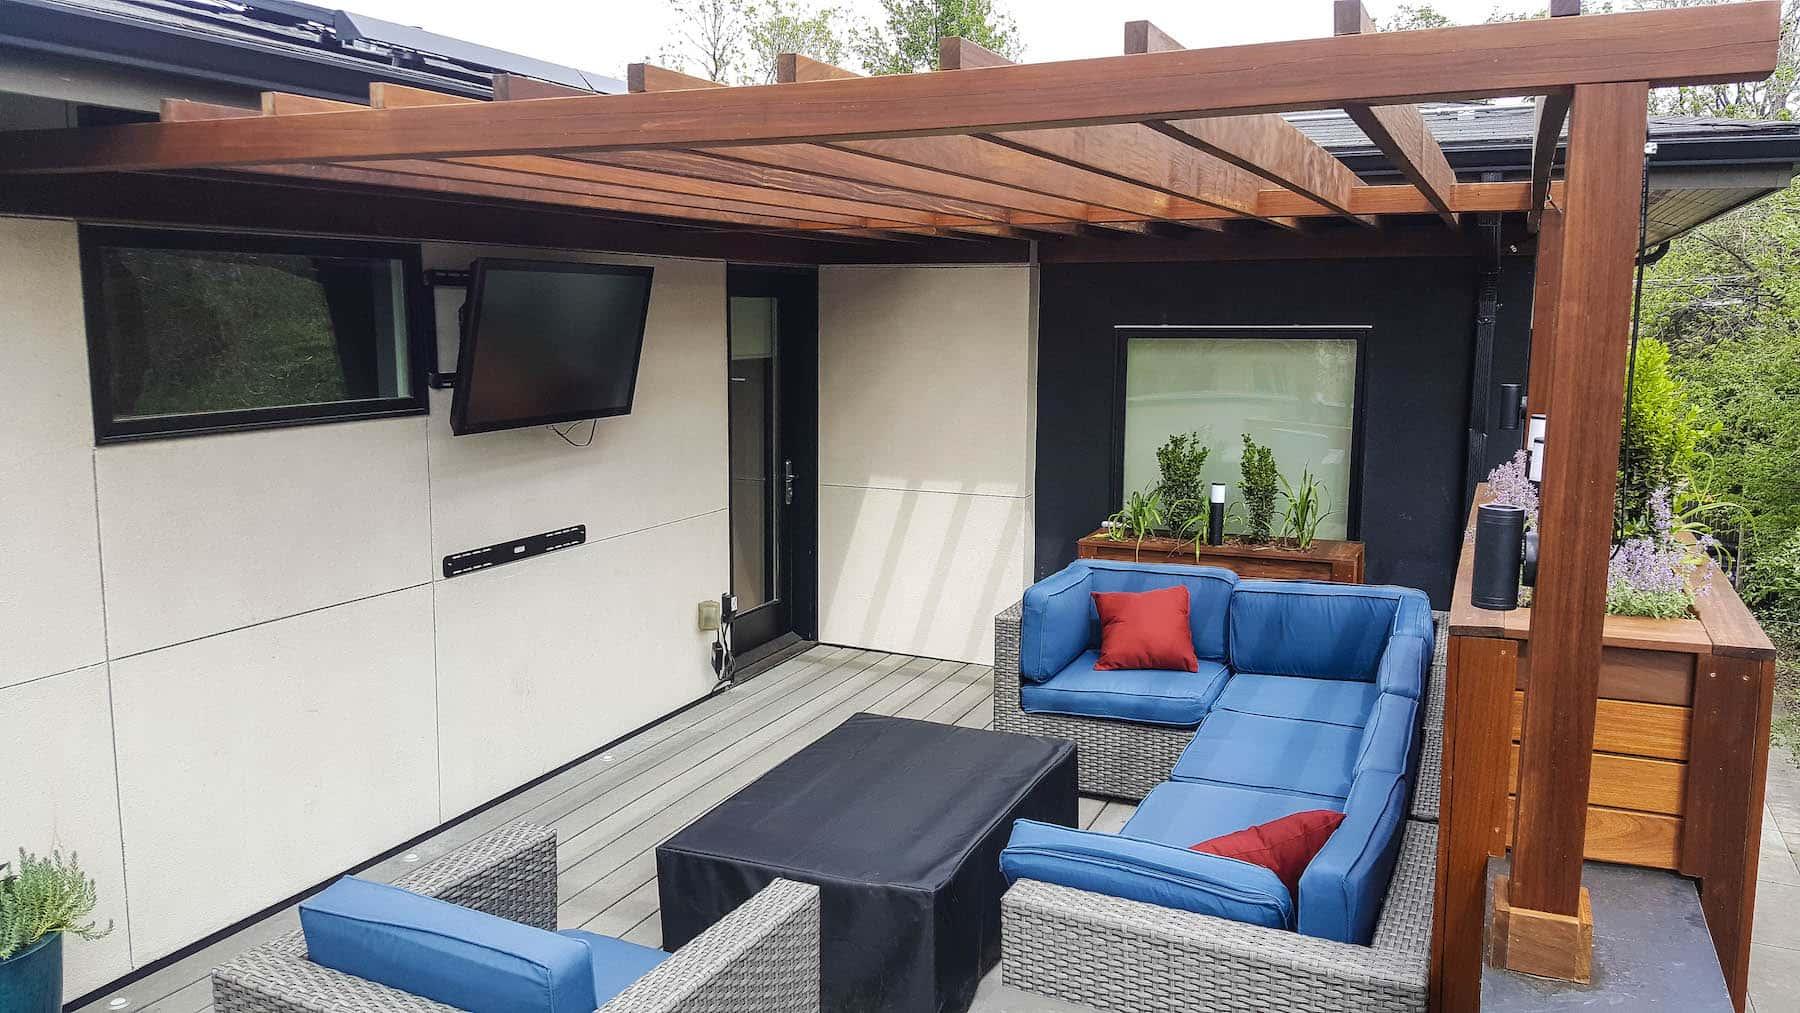 Rooftop Deck With Pergola outdoor TV planters Cherry Creek Denver CO